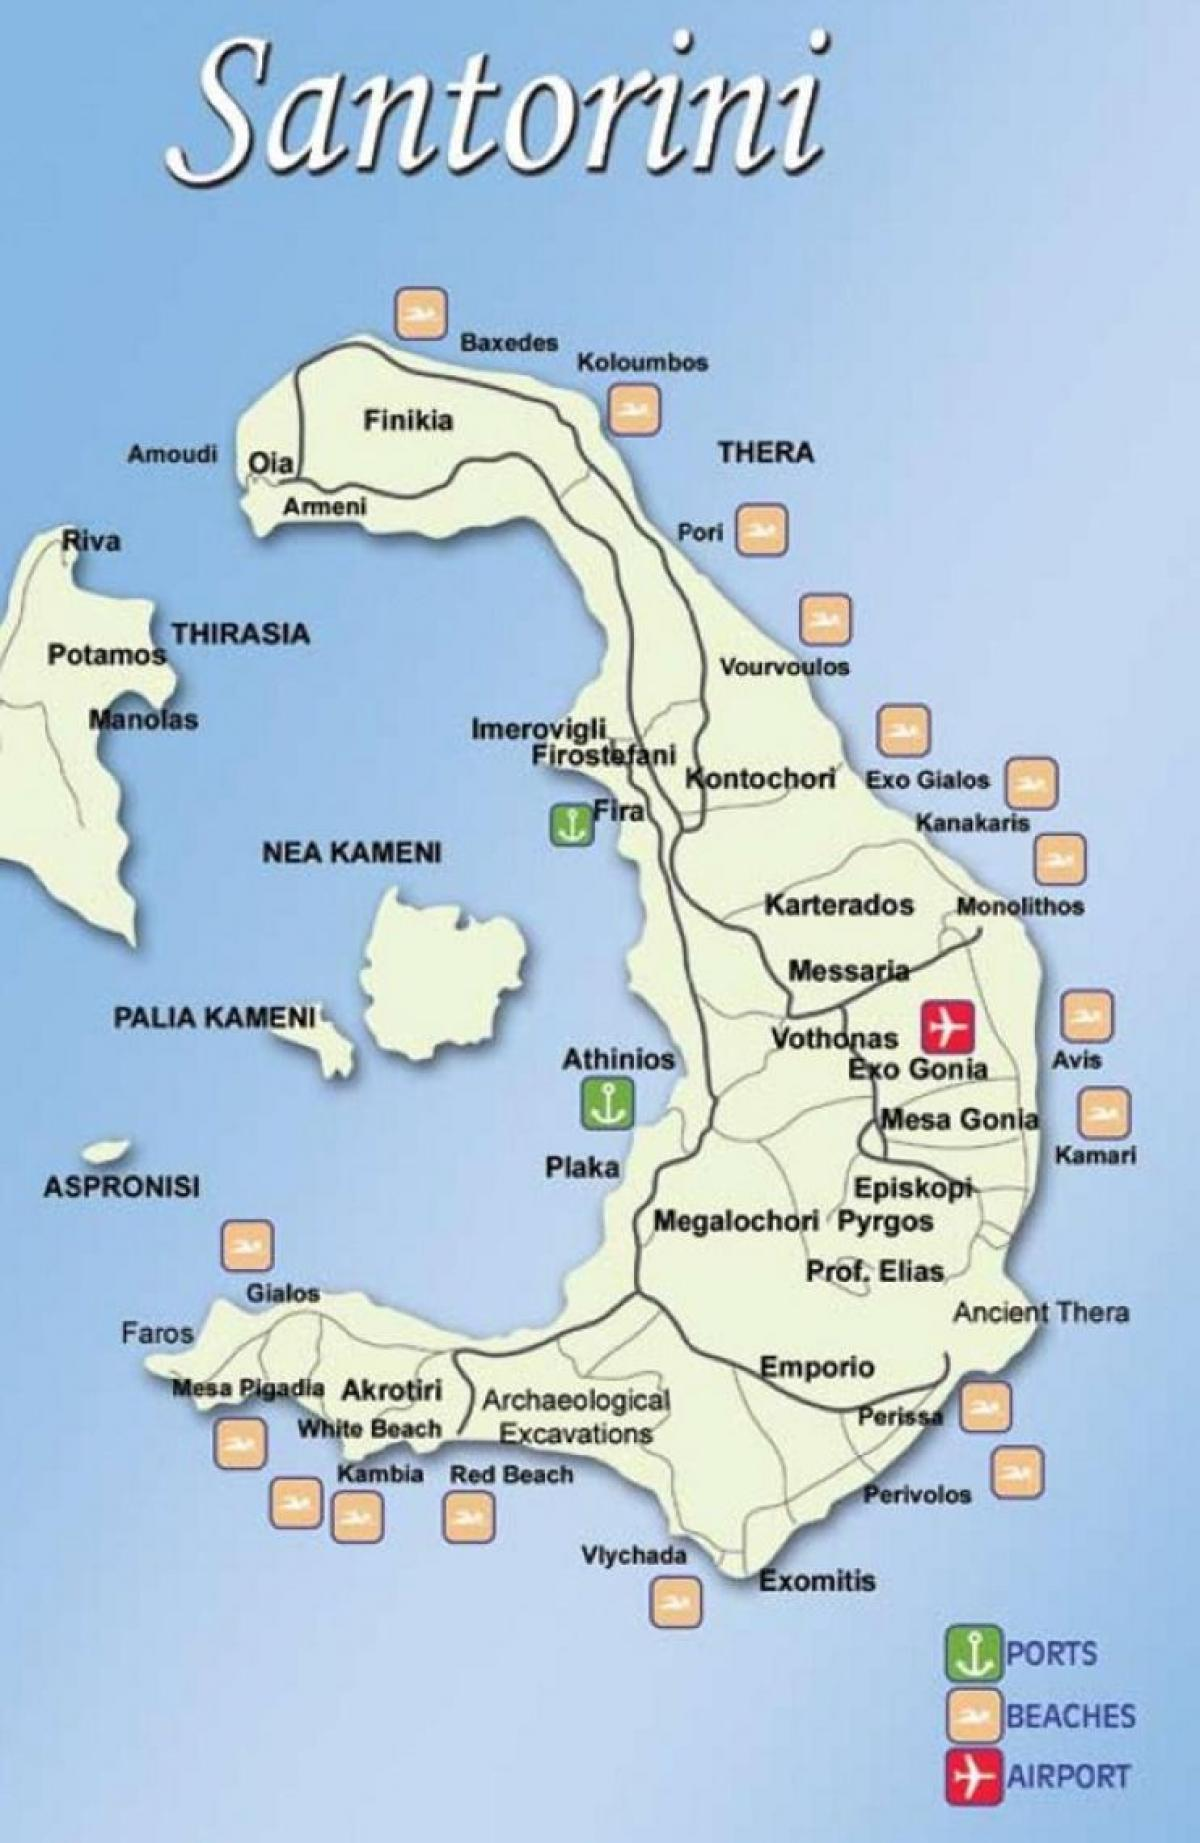 griechische inseln landkarte santorin karte der griechischen inseln santorin europa s d europa. Black Bedroom Furniture Sets. Home Design Ideas